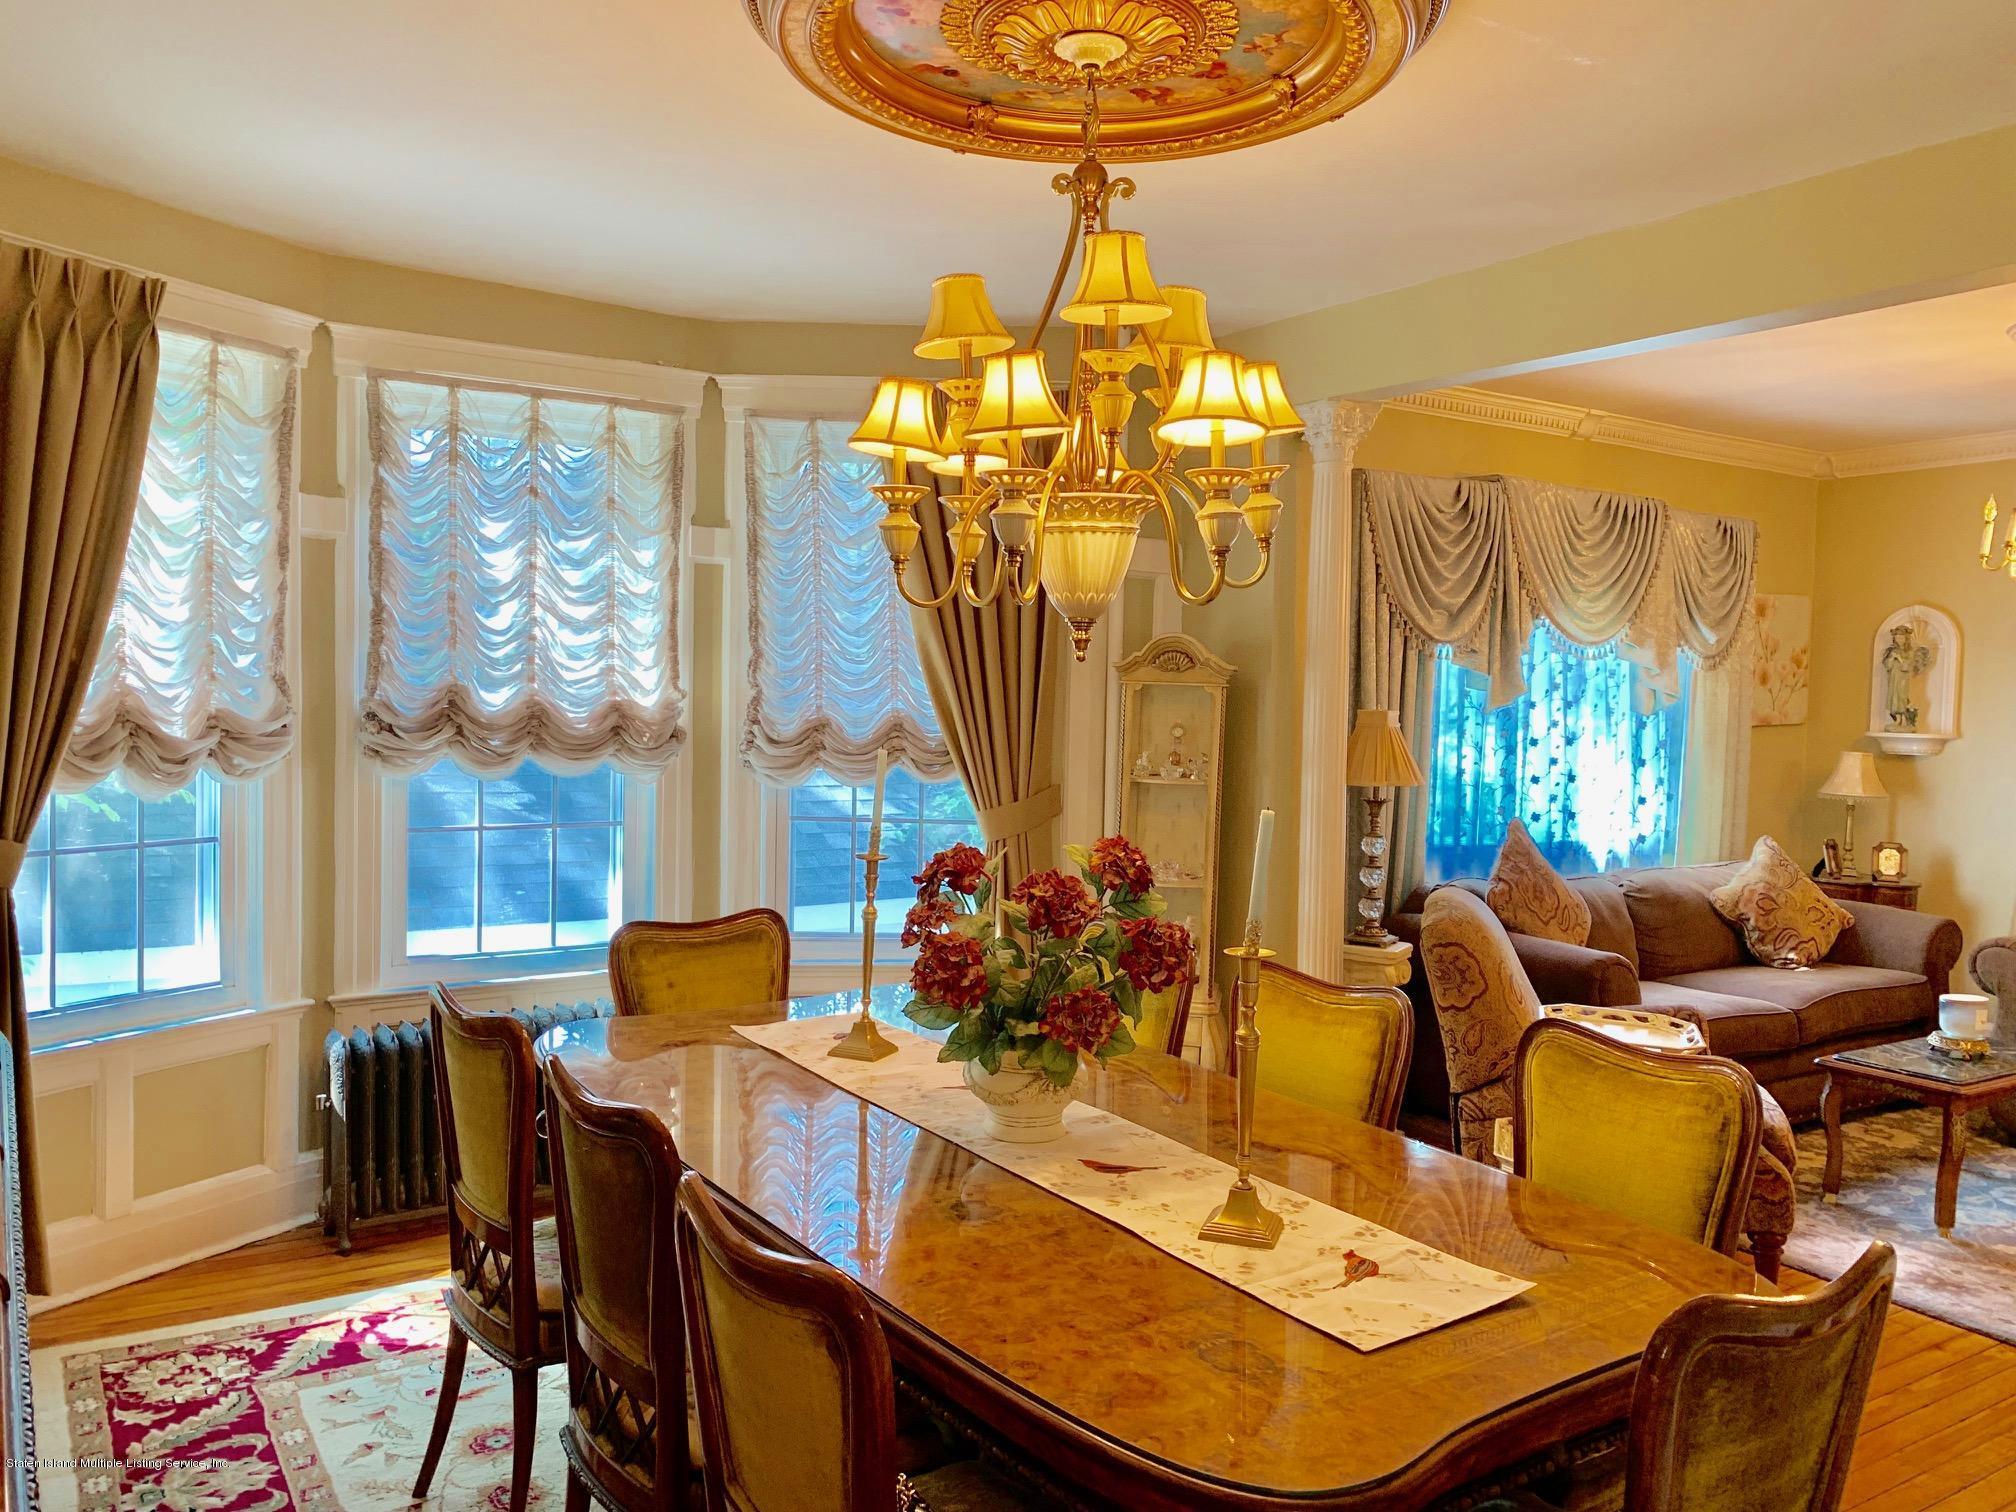 Single Family - Detached 1351 Huguenot Avenue  Staten Island, NY 10312, MLS-1133765-11